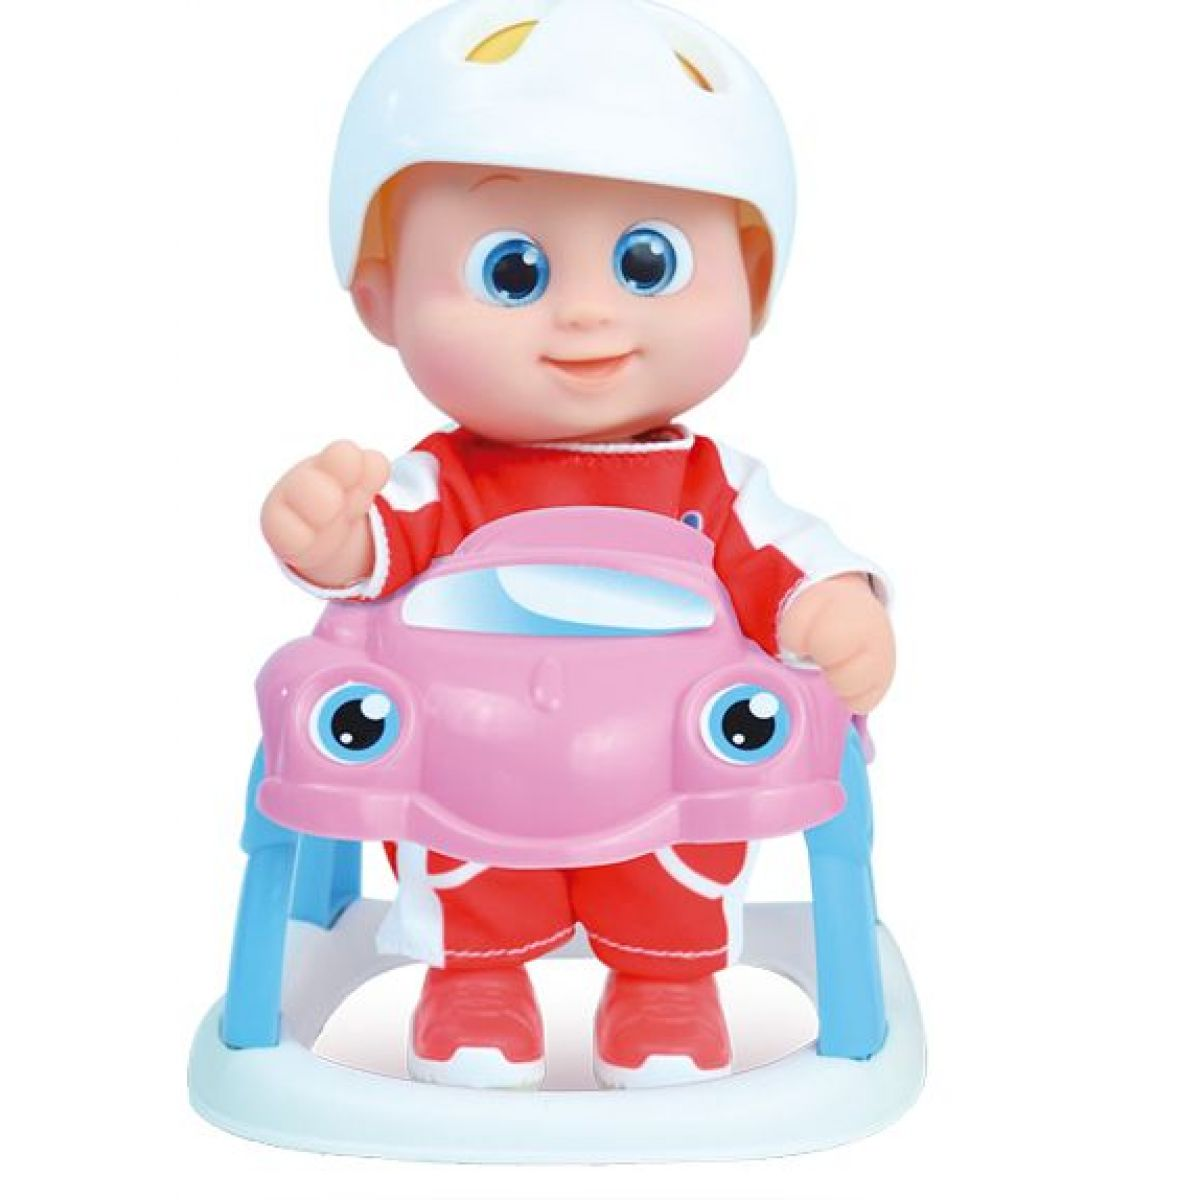 Bábätko Bouncin Babies v autíčku Baniel